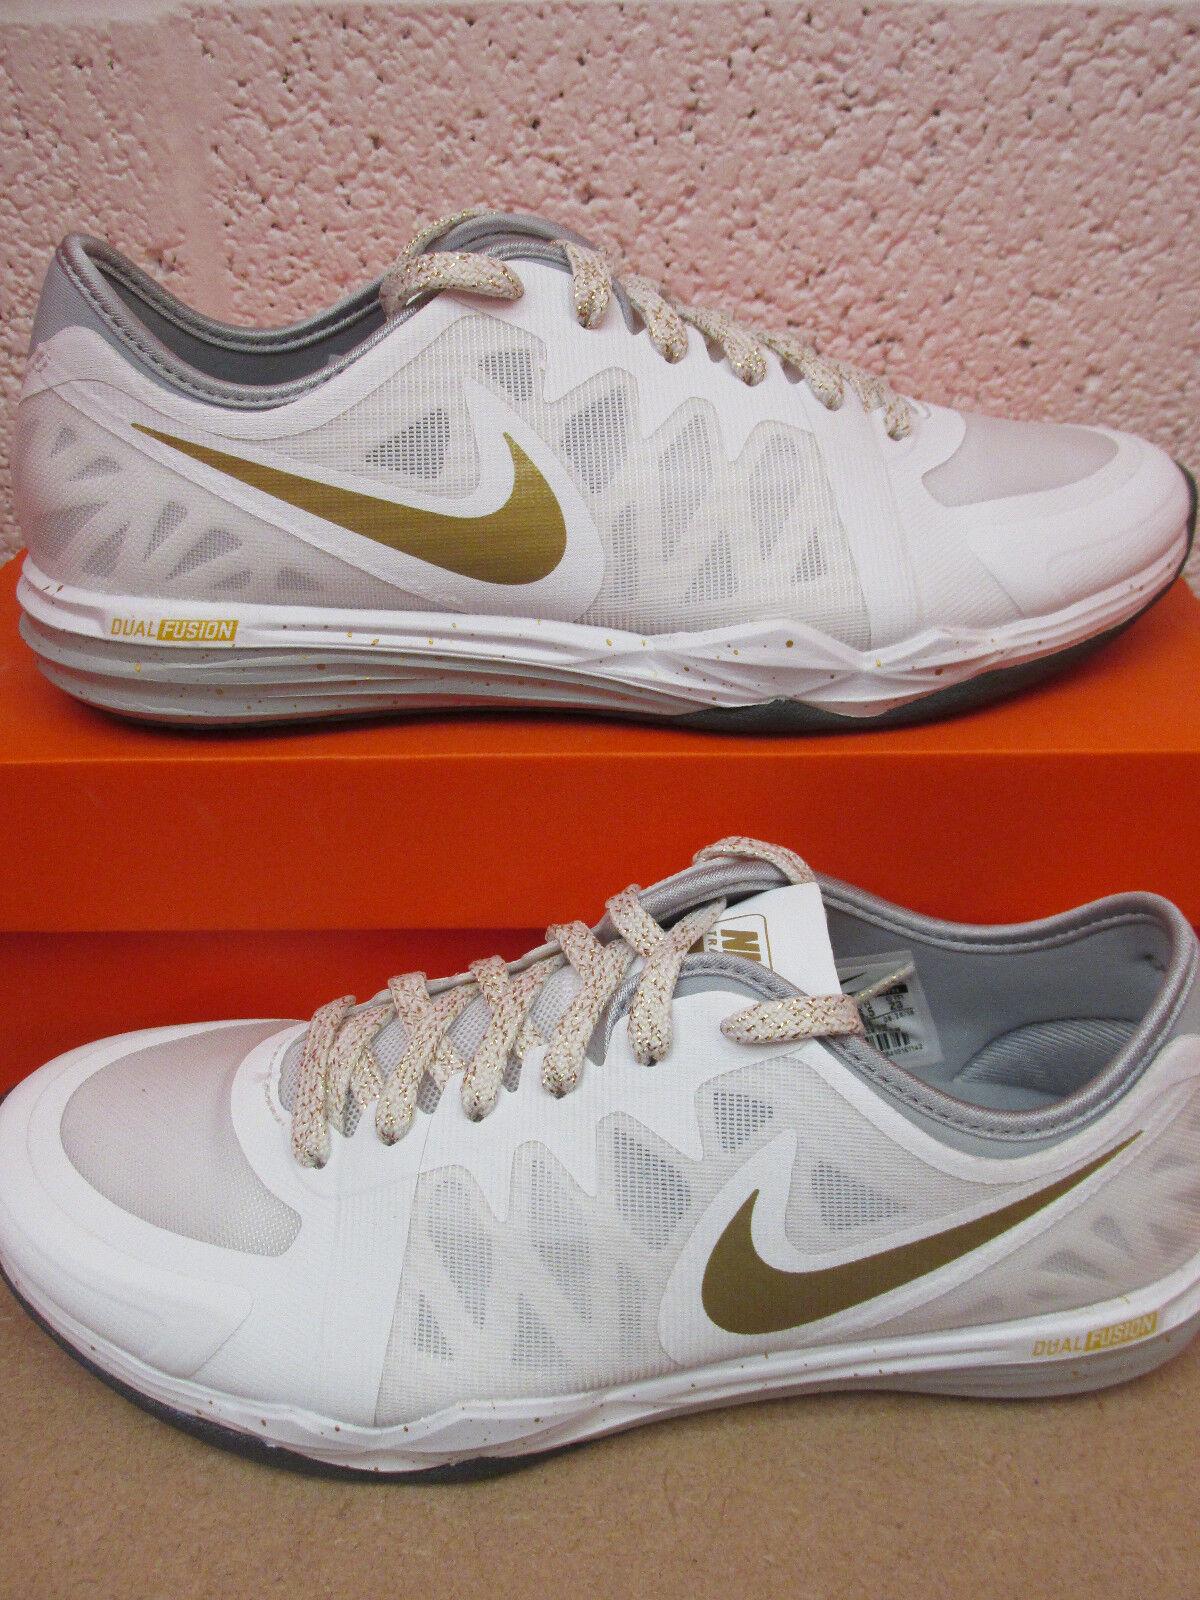 Nike Nike Nike Damenschuhe Dual Fusion TR 3 Print Running Trainers 704941 103 Sneakers Schuhes 426936